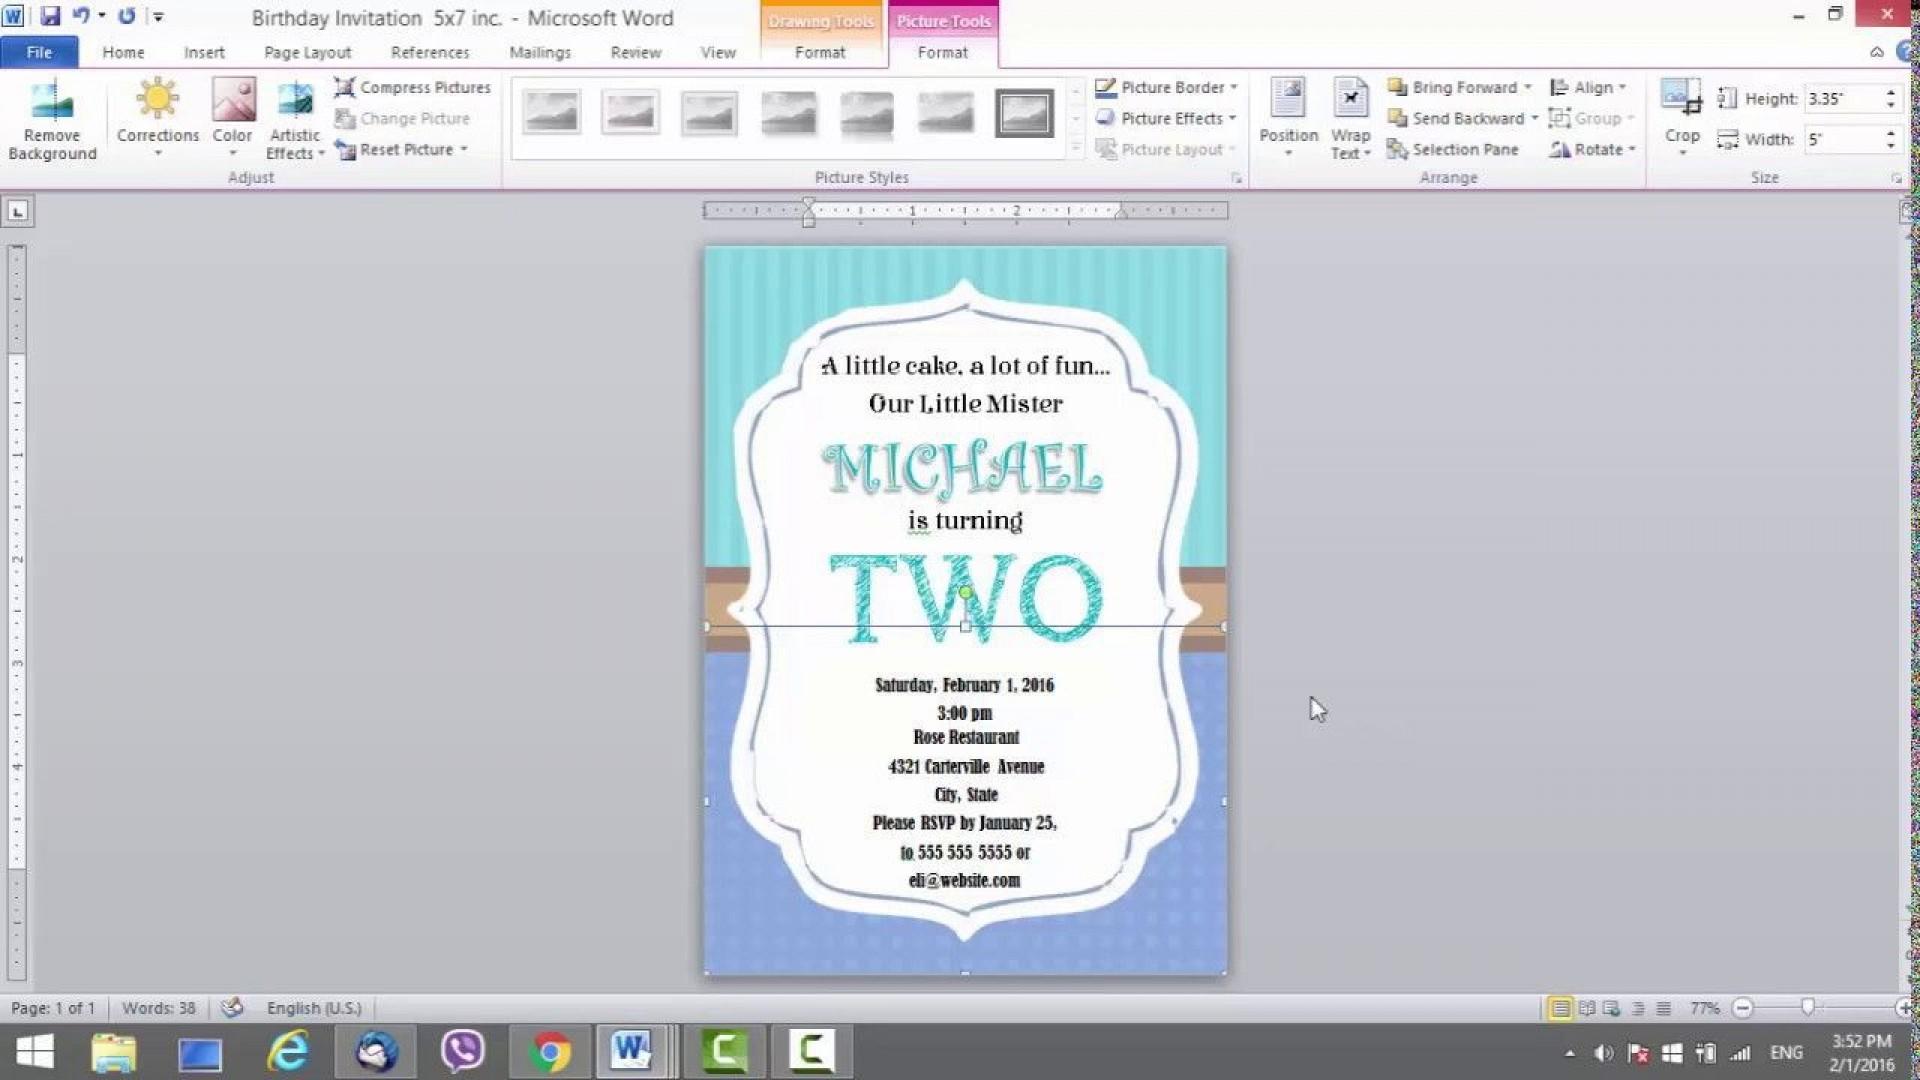 009 Stunning Birthday Invitation Card Word Format Highest Clarity  Template Free1920